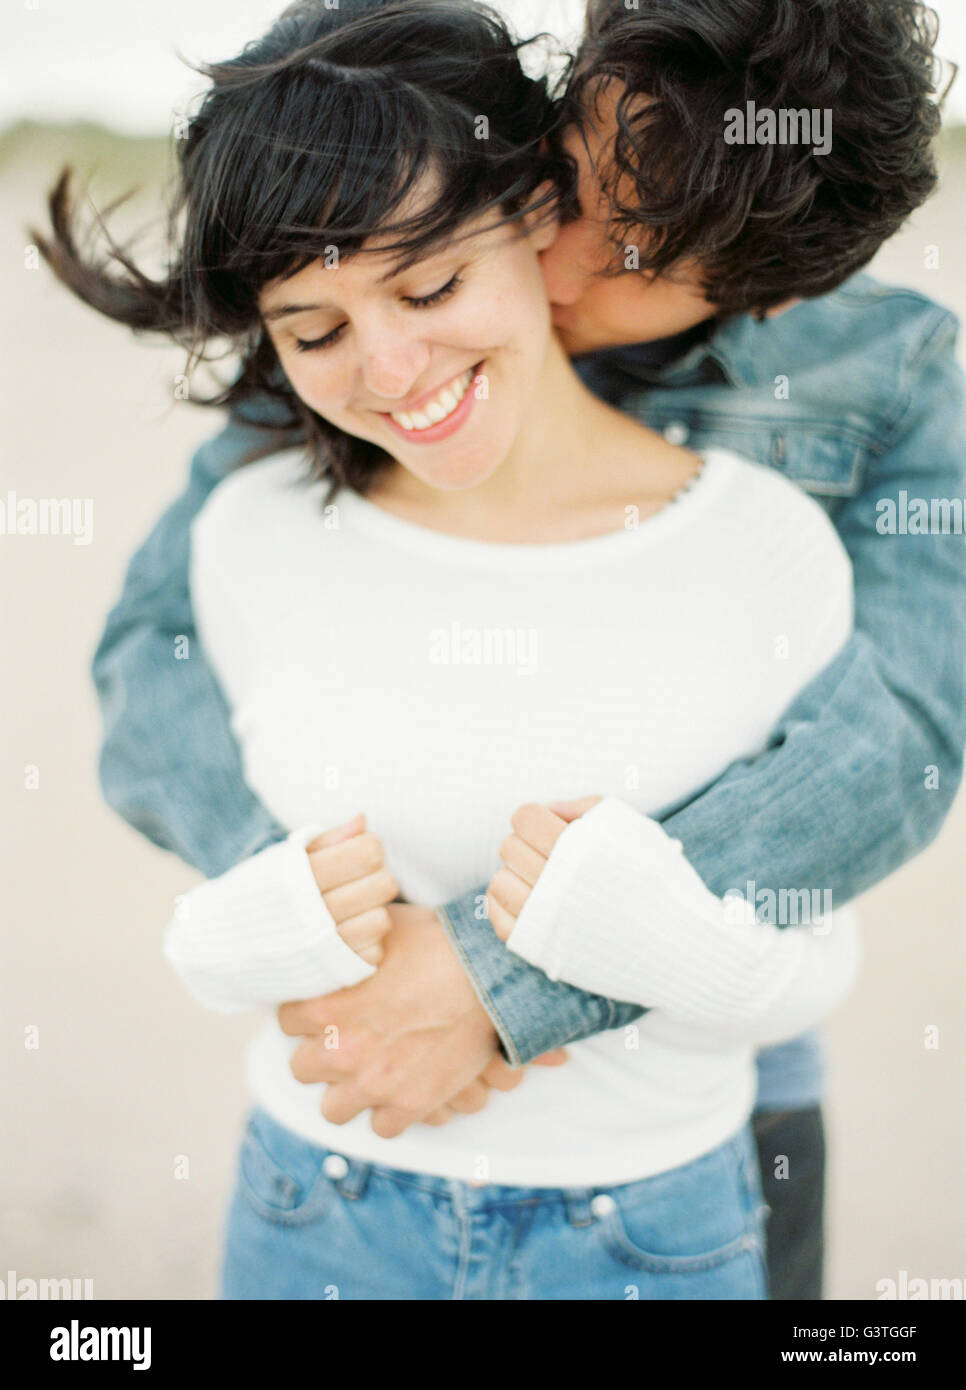 España, Valencia, hombre abrazar y besar novia Imagen De Stock